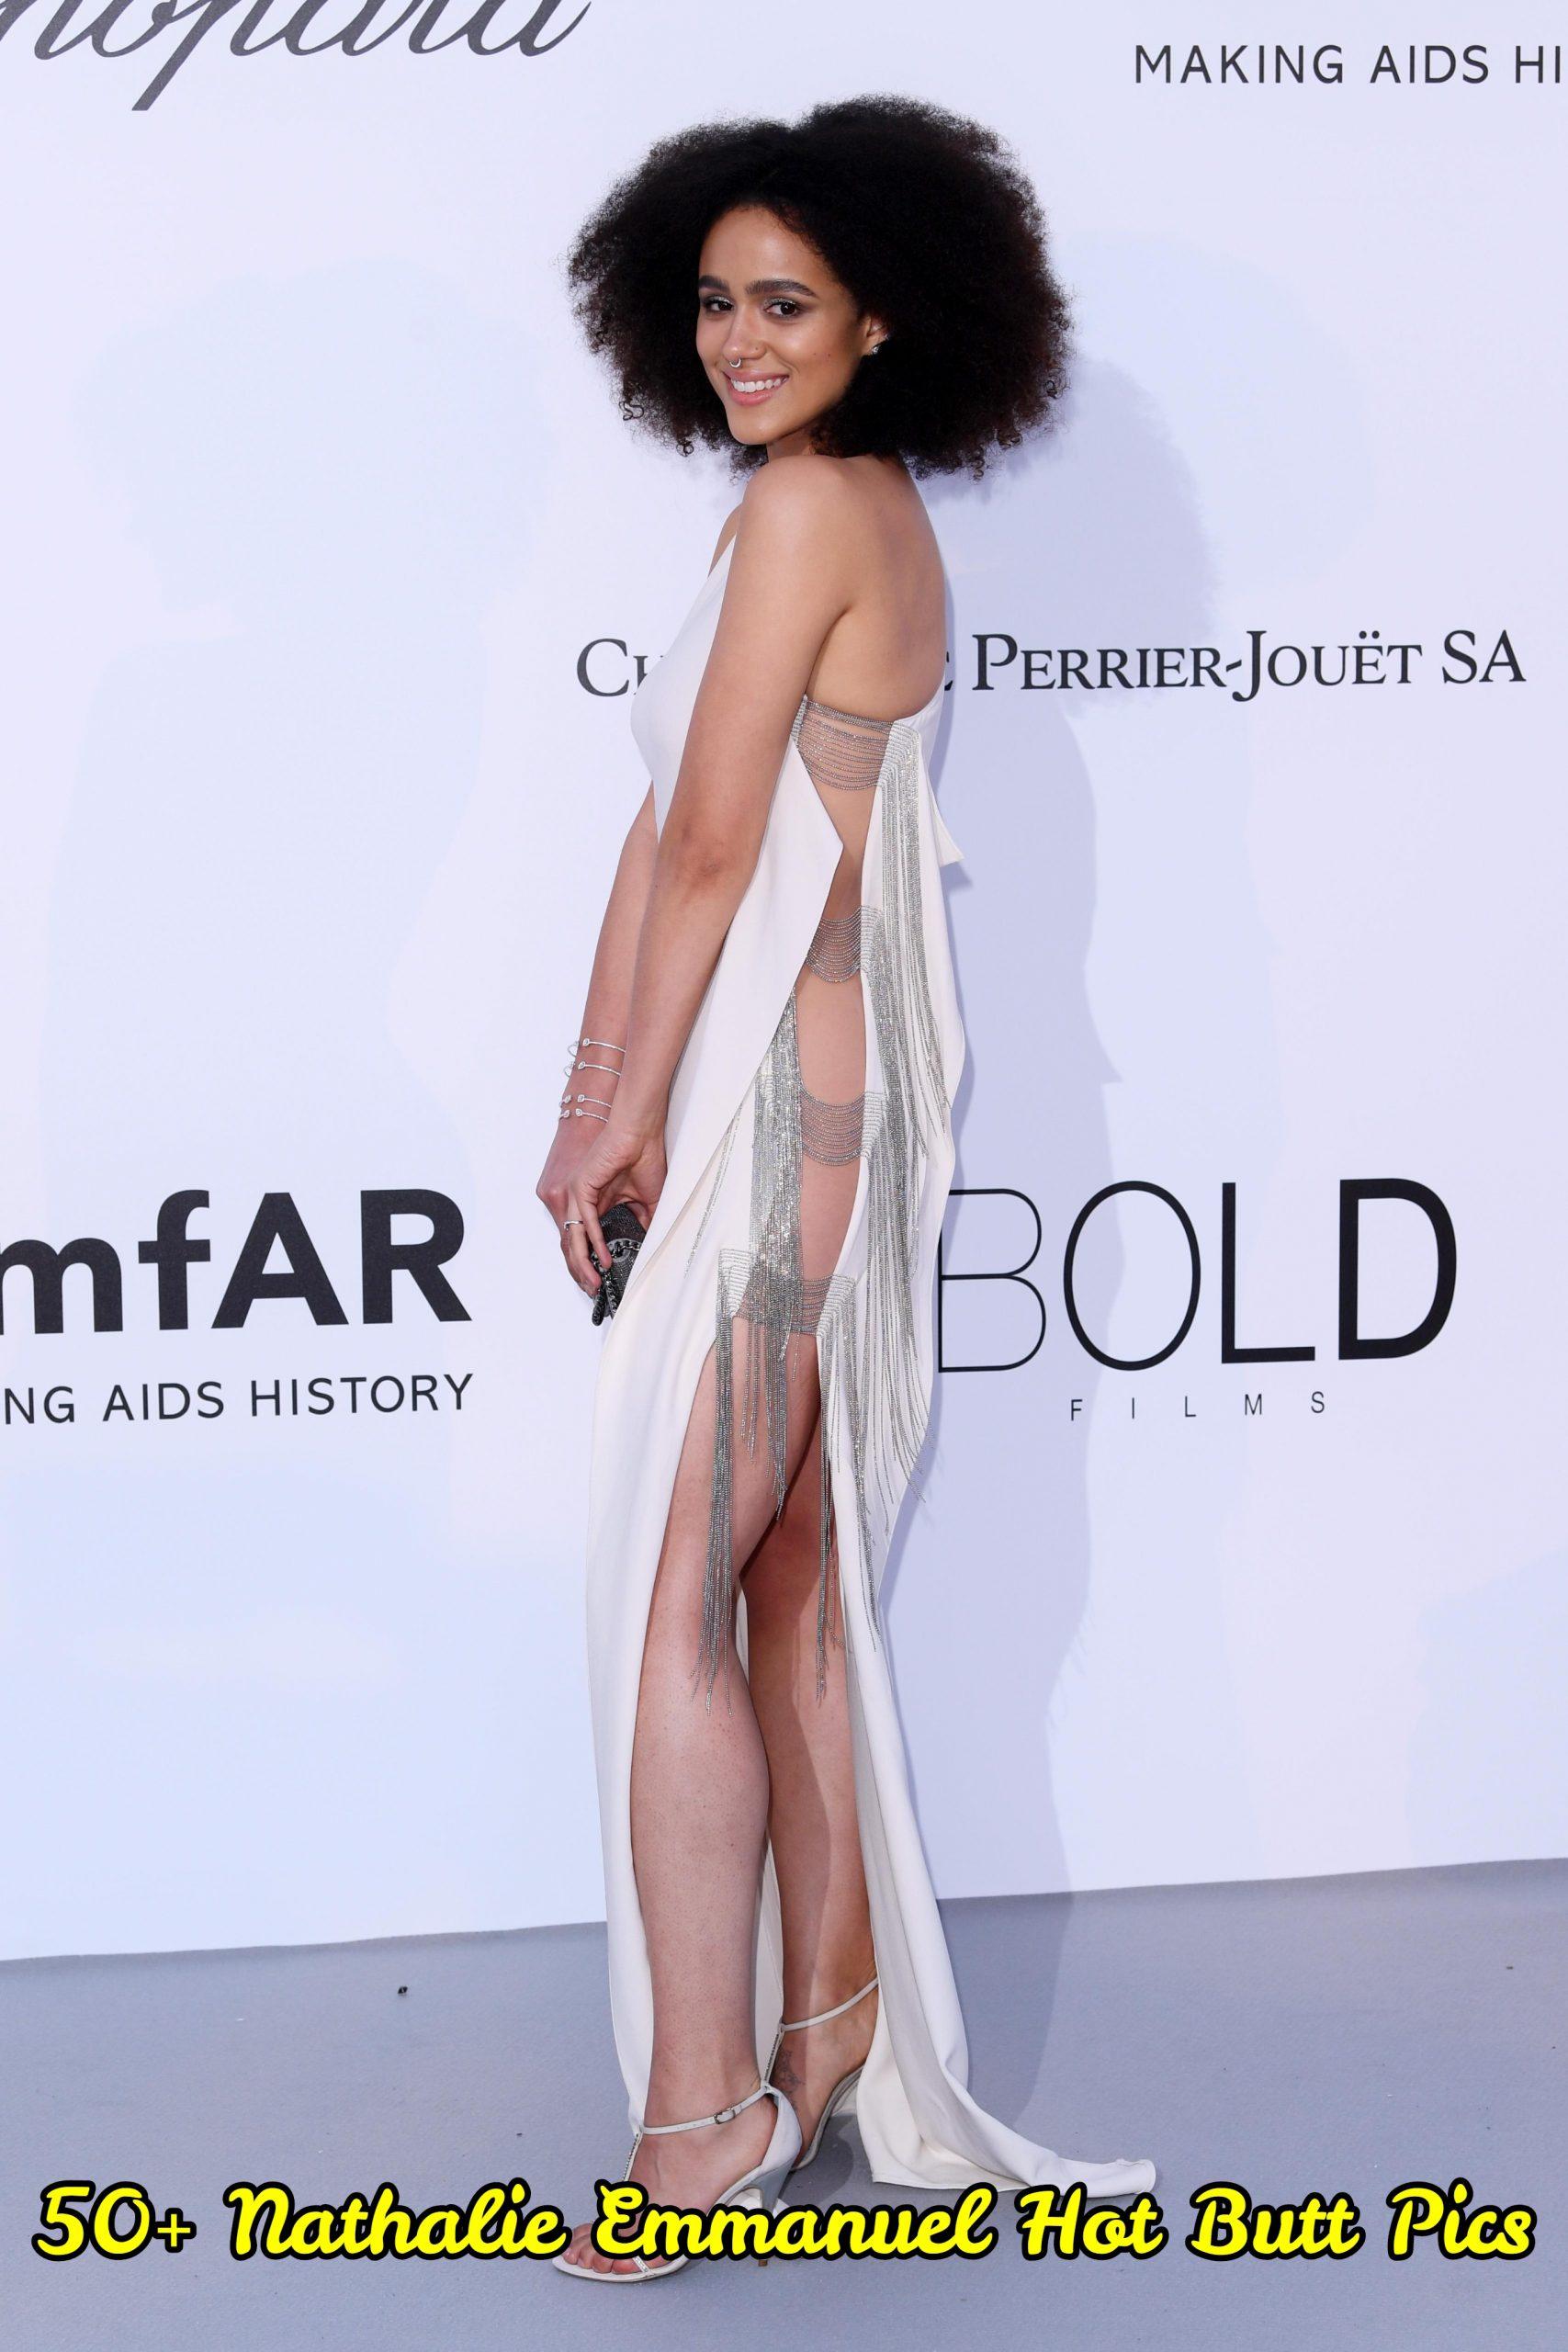 Nathalie Emmanuel Hot Butt Pics